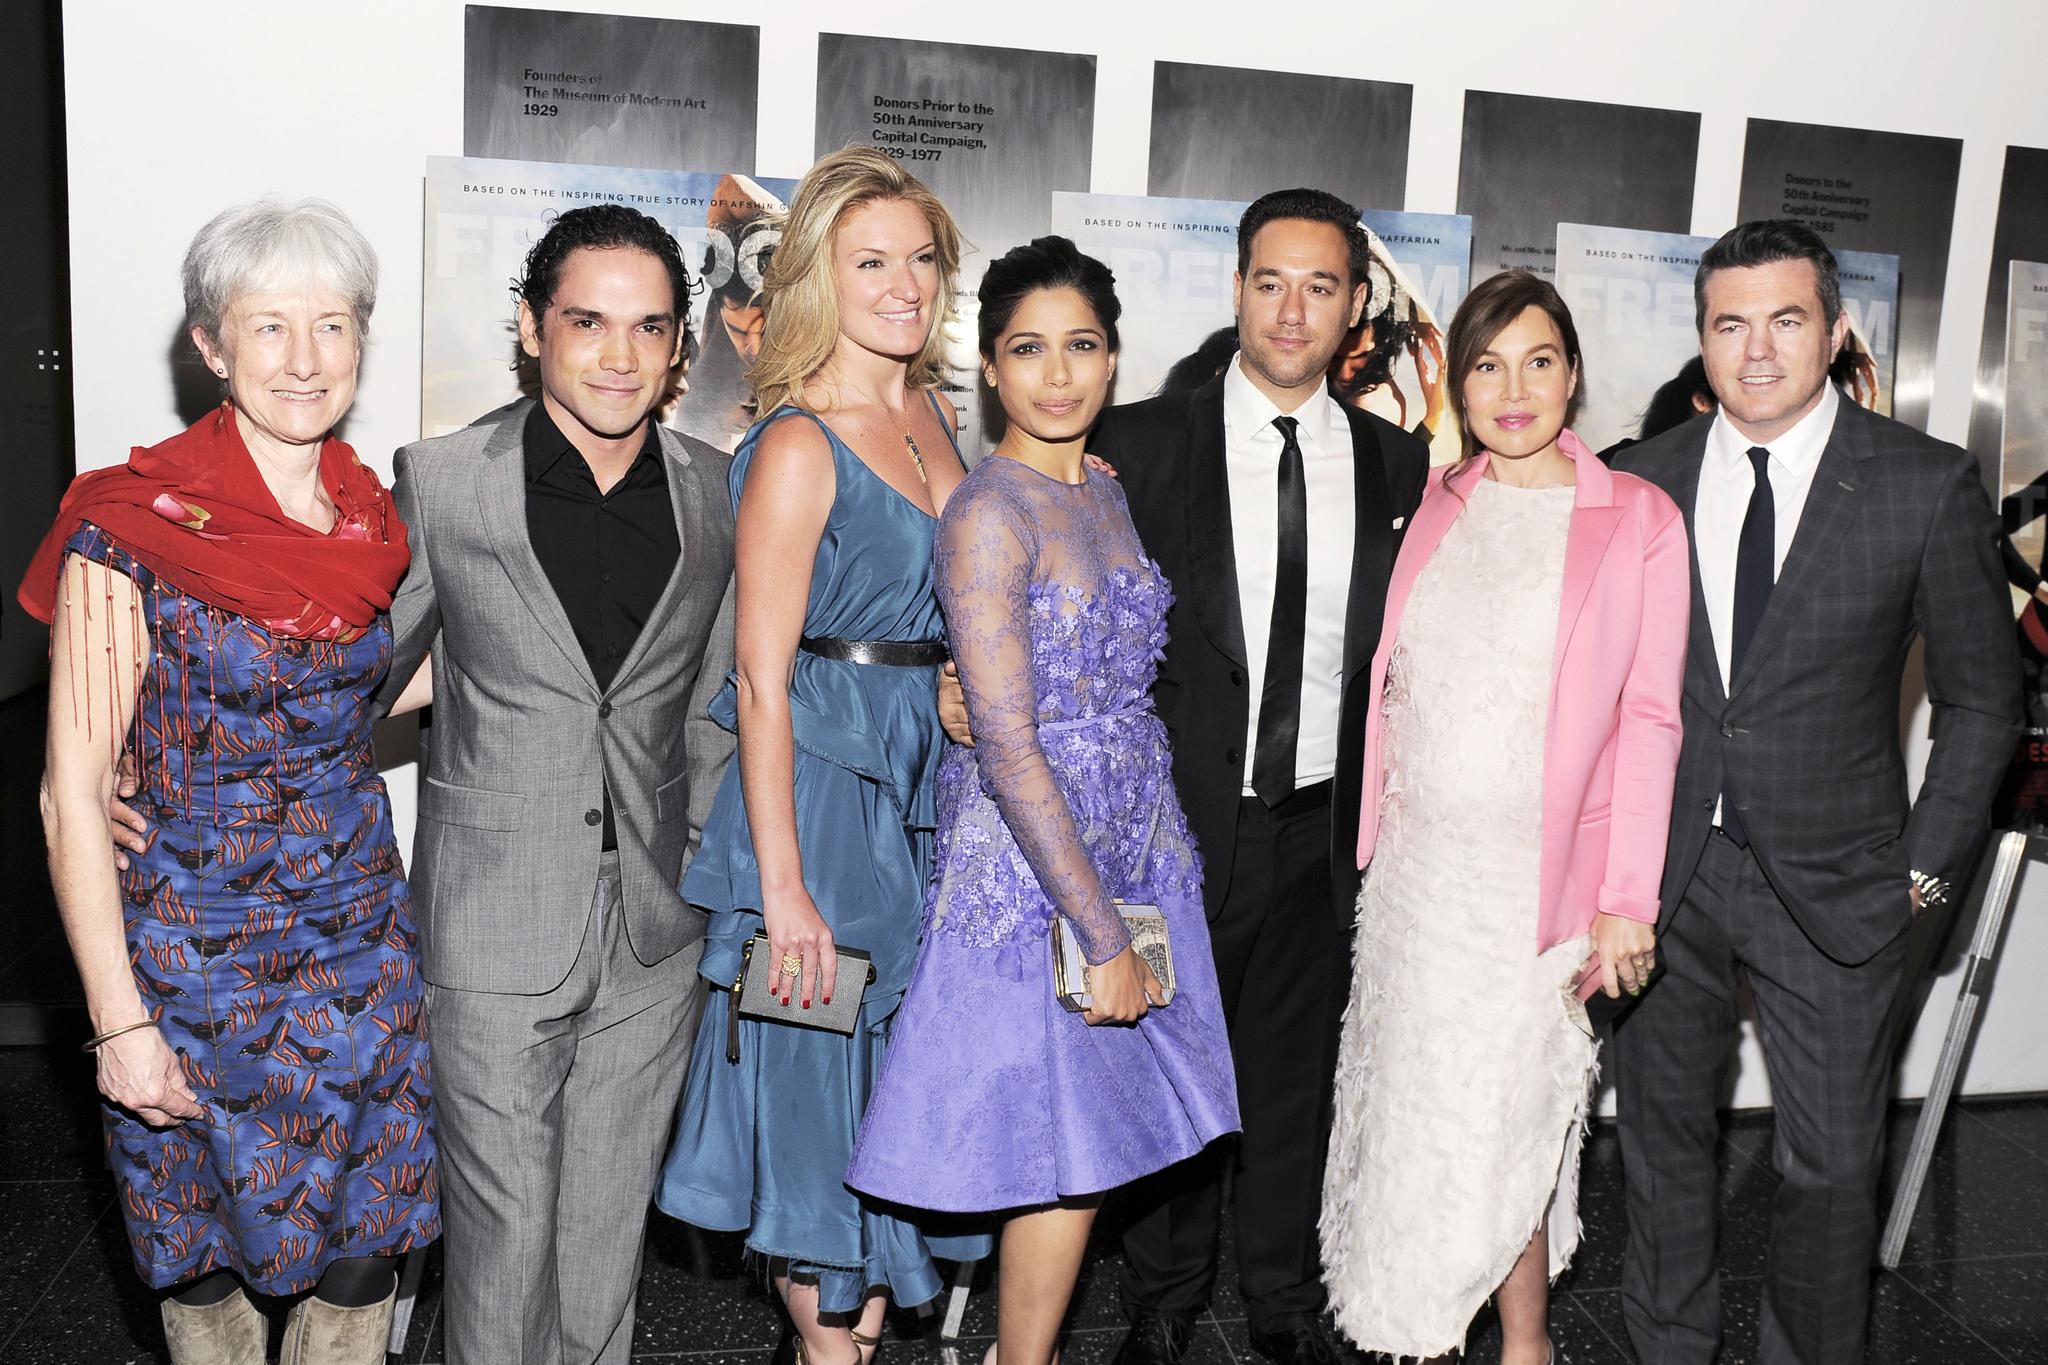 Pippa Cross, Tucker Tooley, Richard Raymond, Reece Ritchie, Freida Pinto, Sarah Arison and Fabiola Beracasa at event of Desert Dancer (2014)